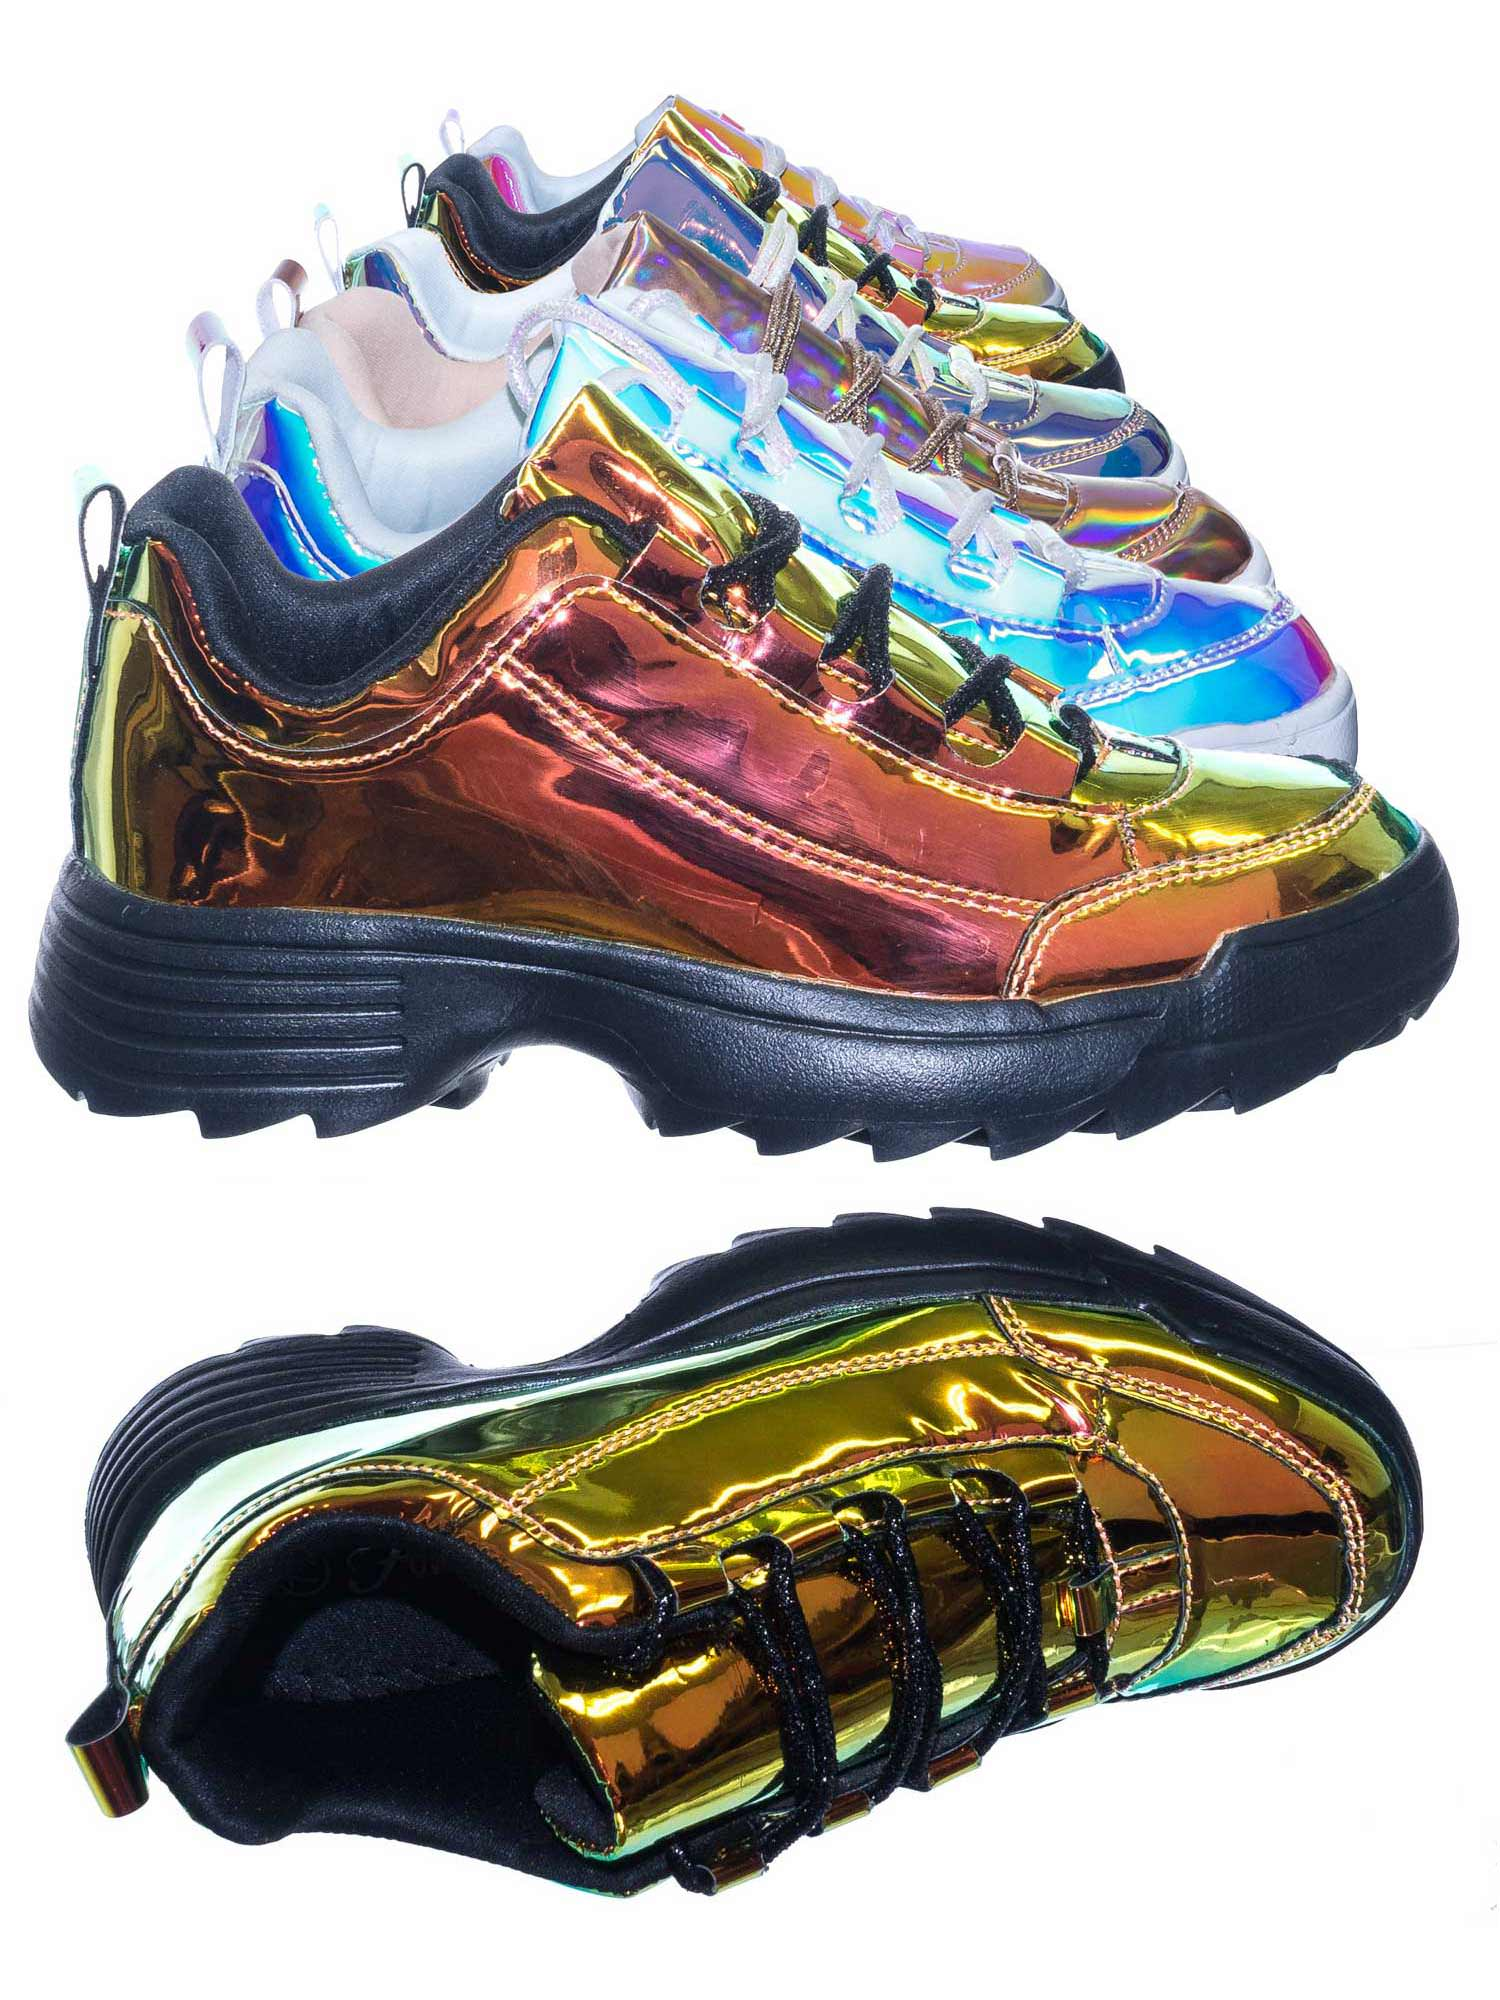 Adobe11 by Forever Link, Lightweight Foam Shark tooth Platform Holographic Vinyl Metallic Sneaker